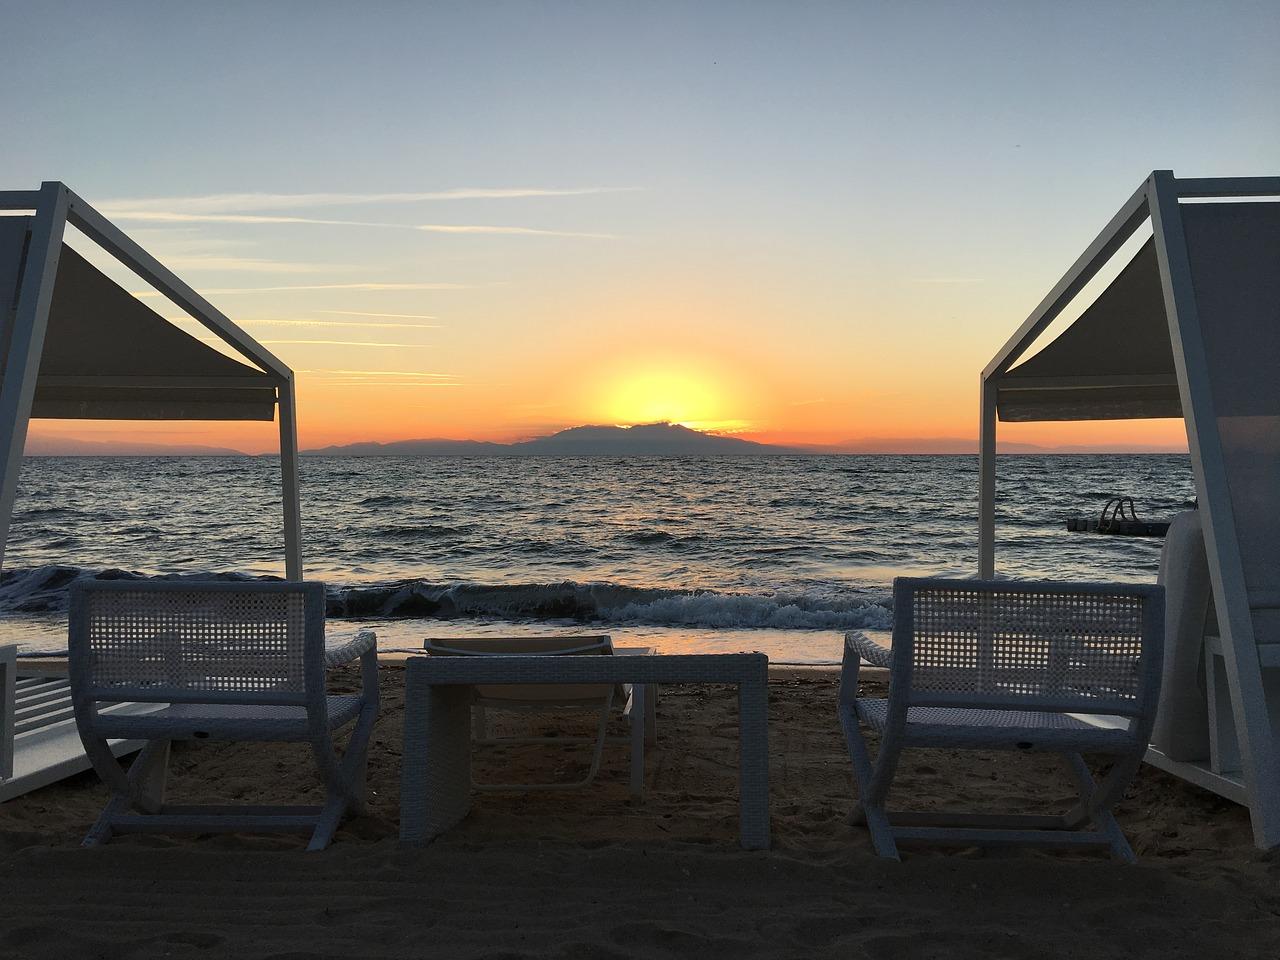 View of Mount Olympus from Halkidiki